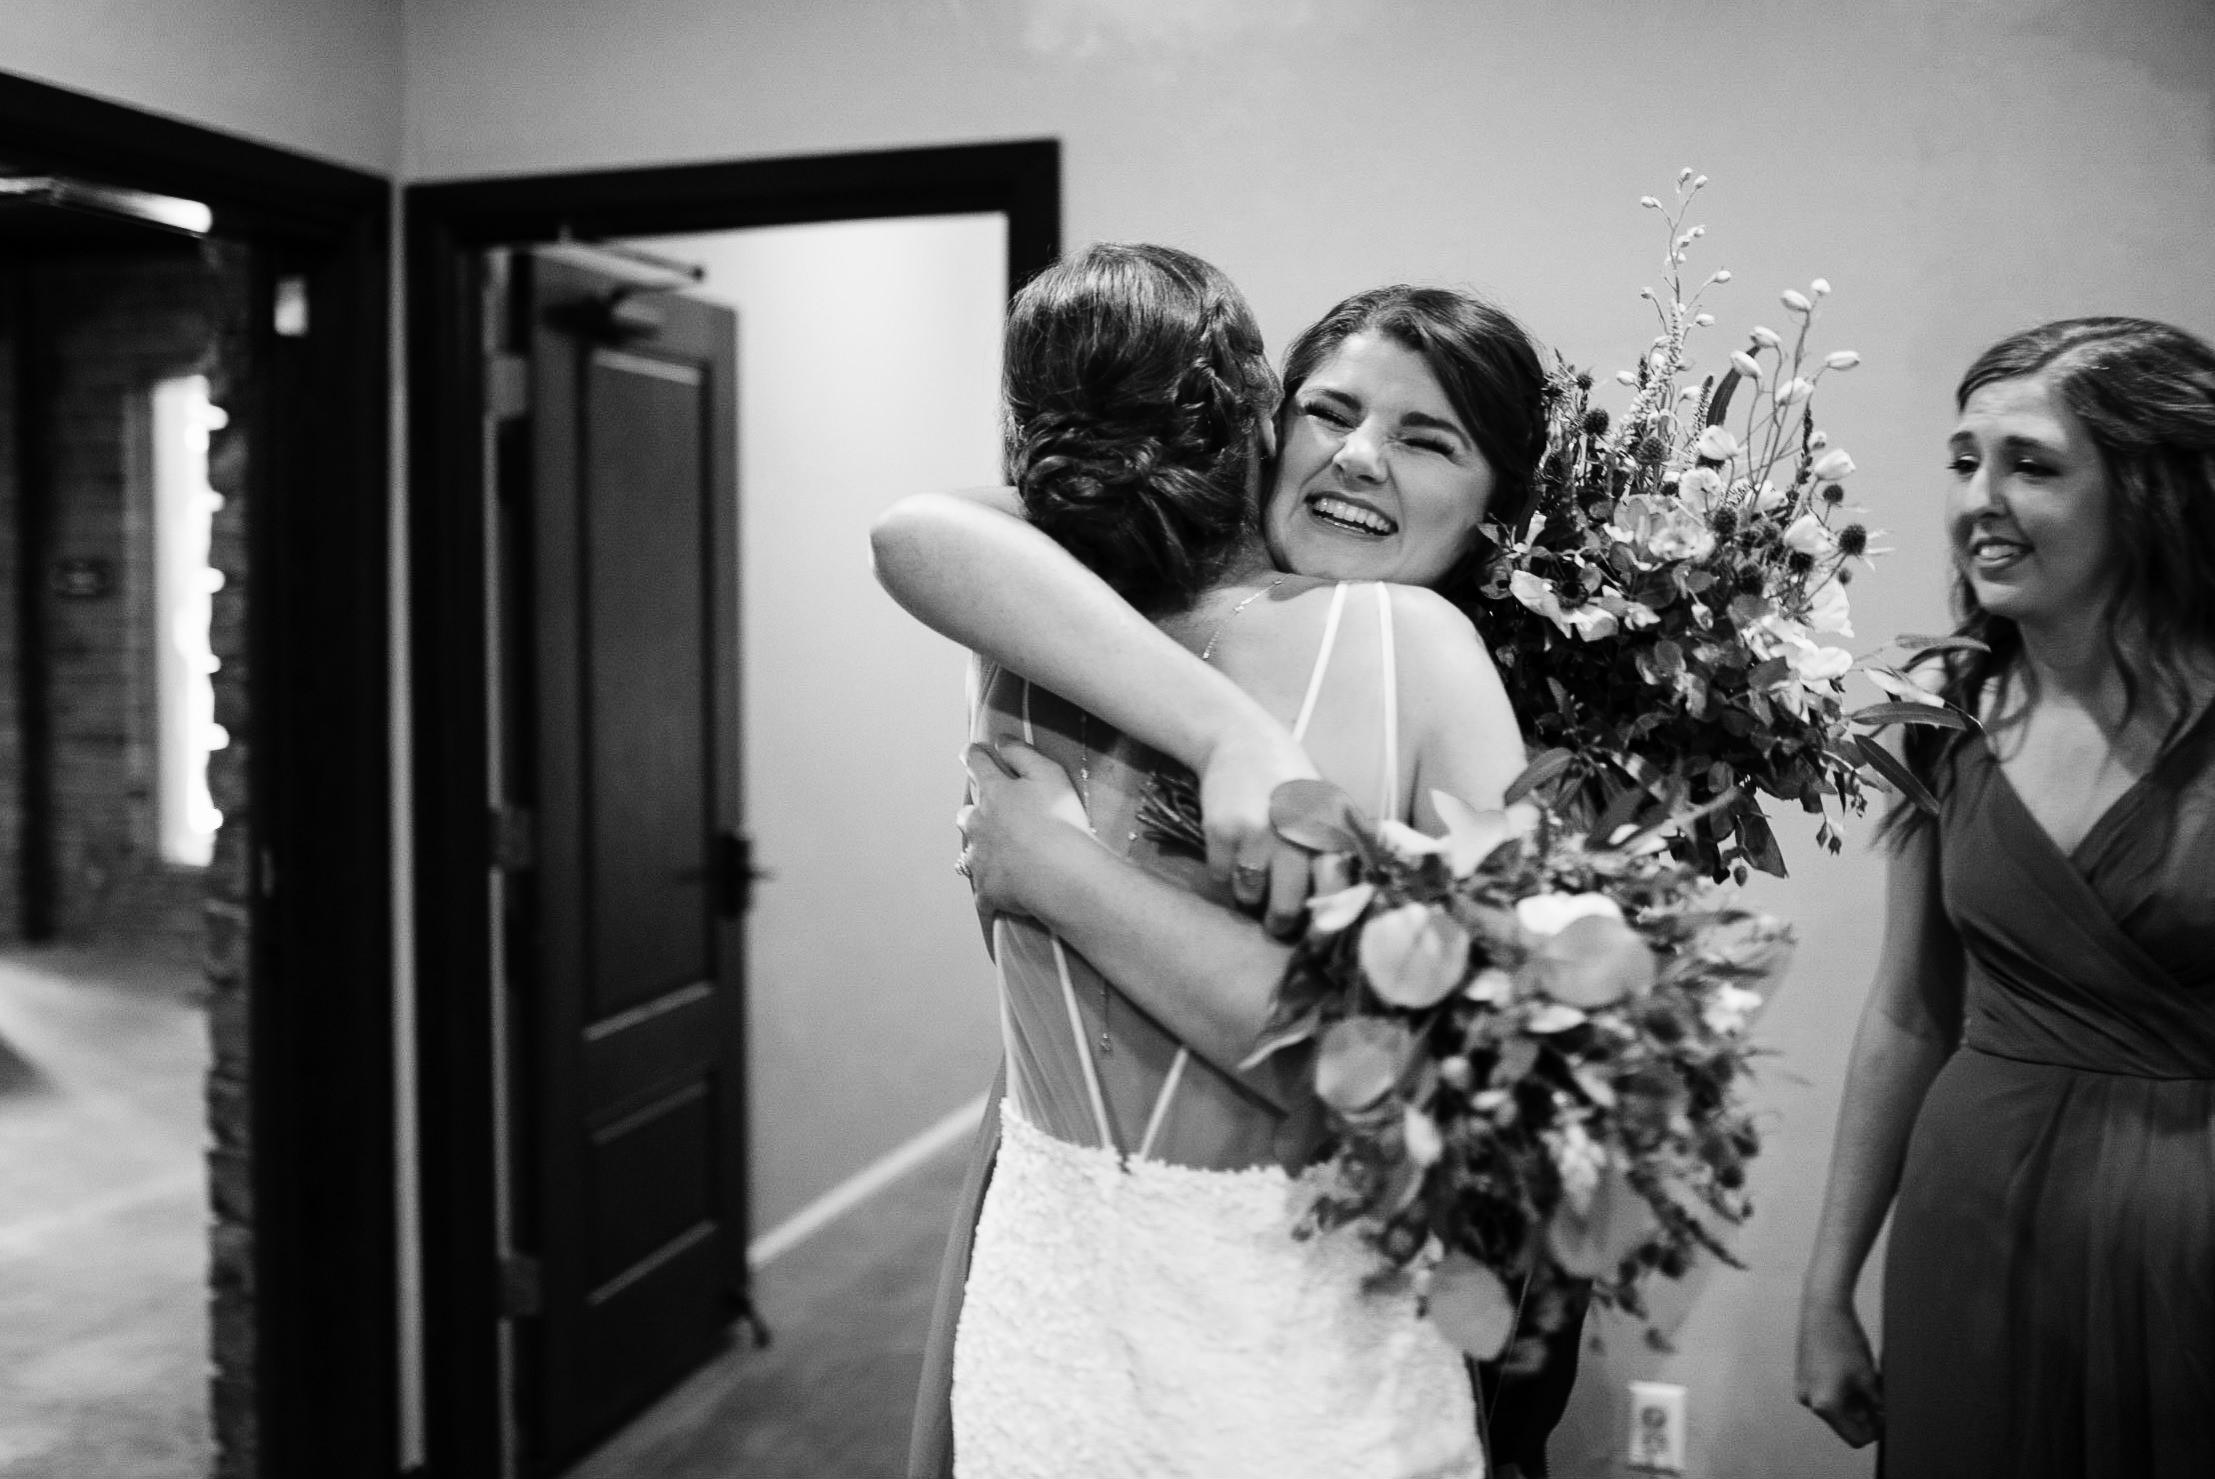 okc-wedding-photographer-coles-garden-wedding-okc-best-wedding-photographers-130.jpg